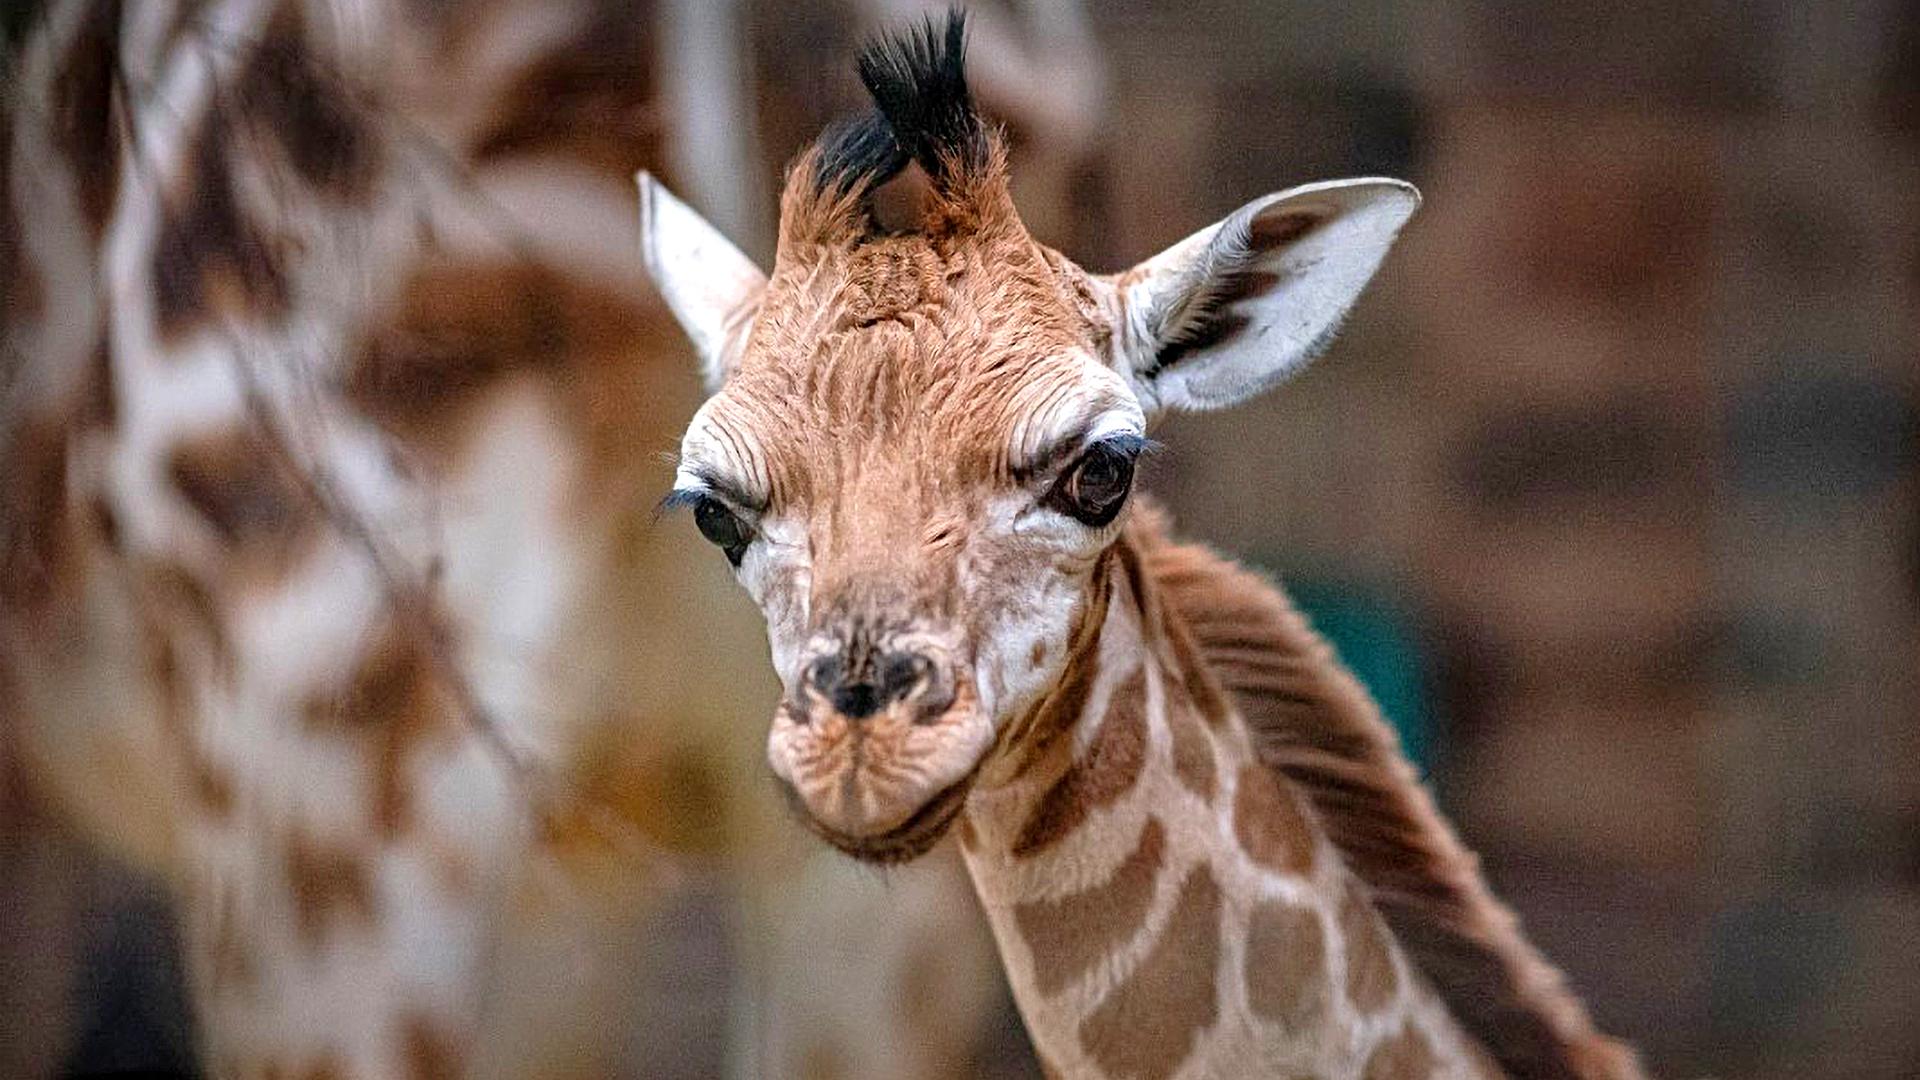 VIDEO: High Mom! Incredible Birth Of Baby Giraffe